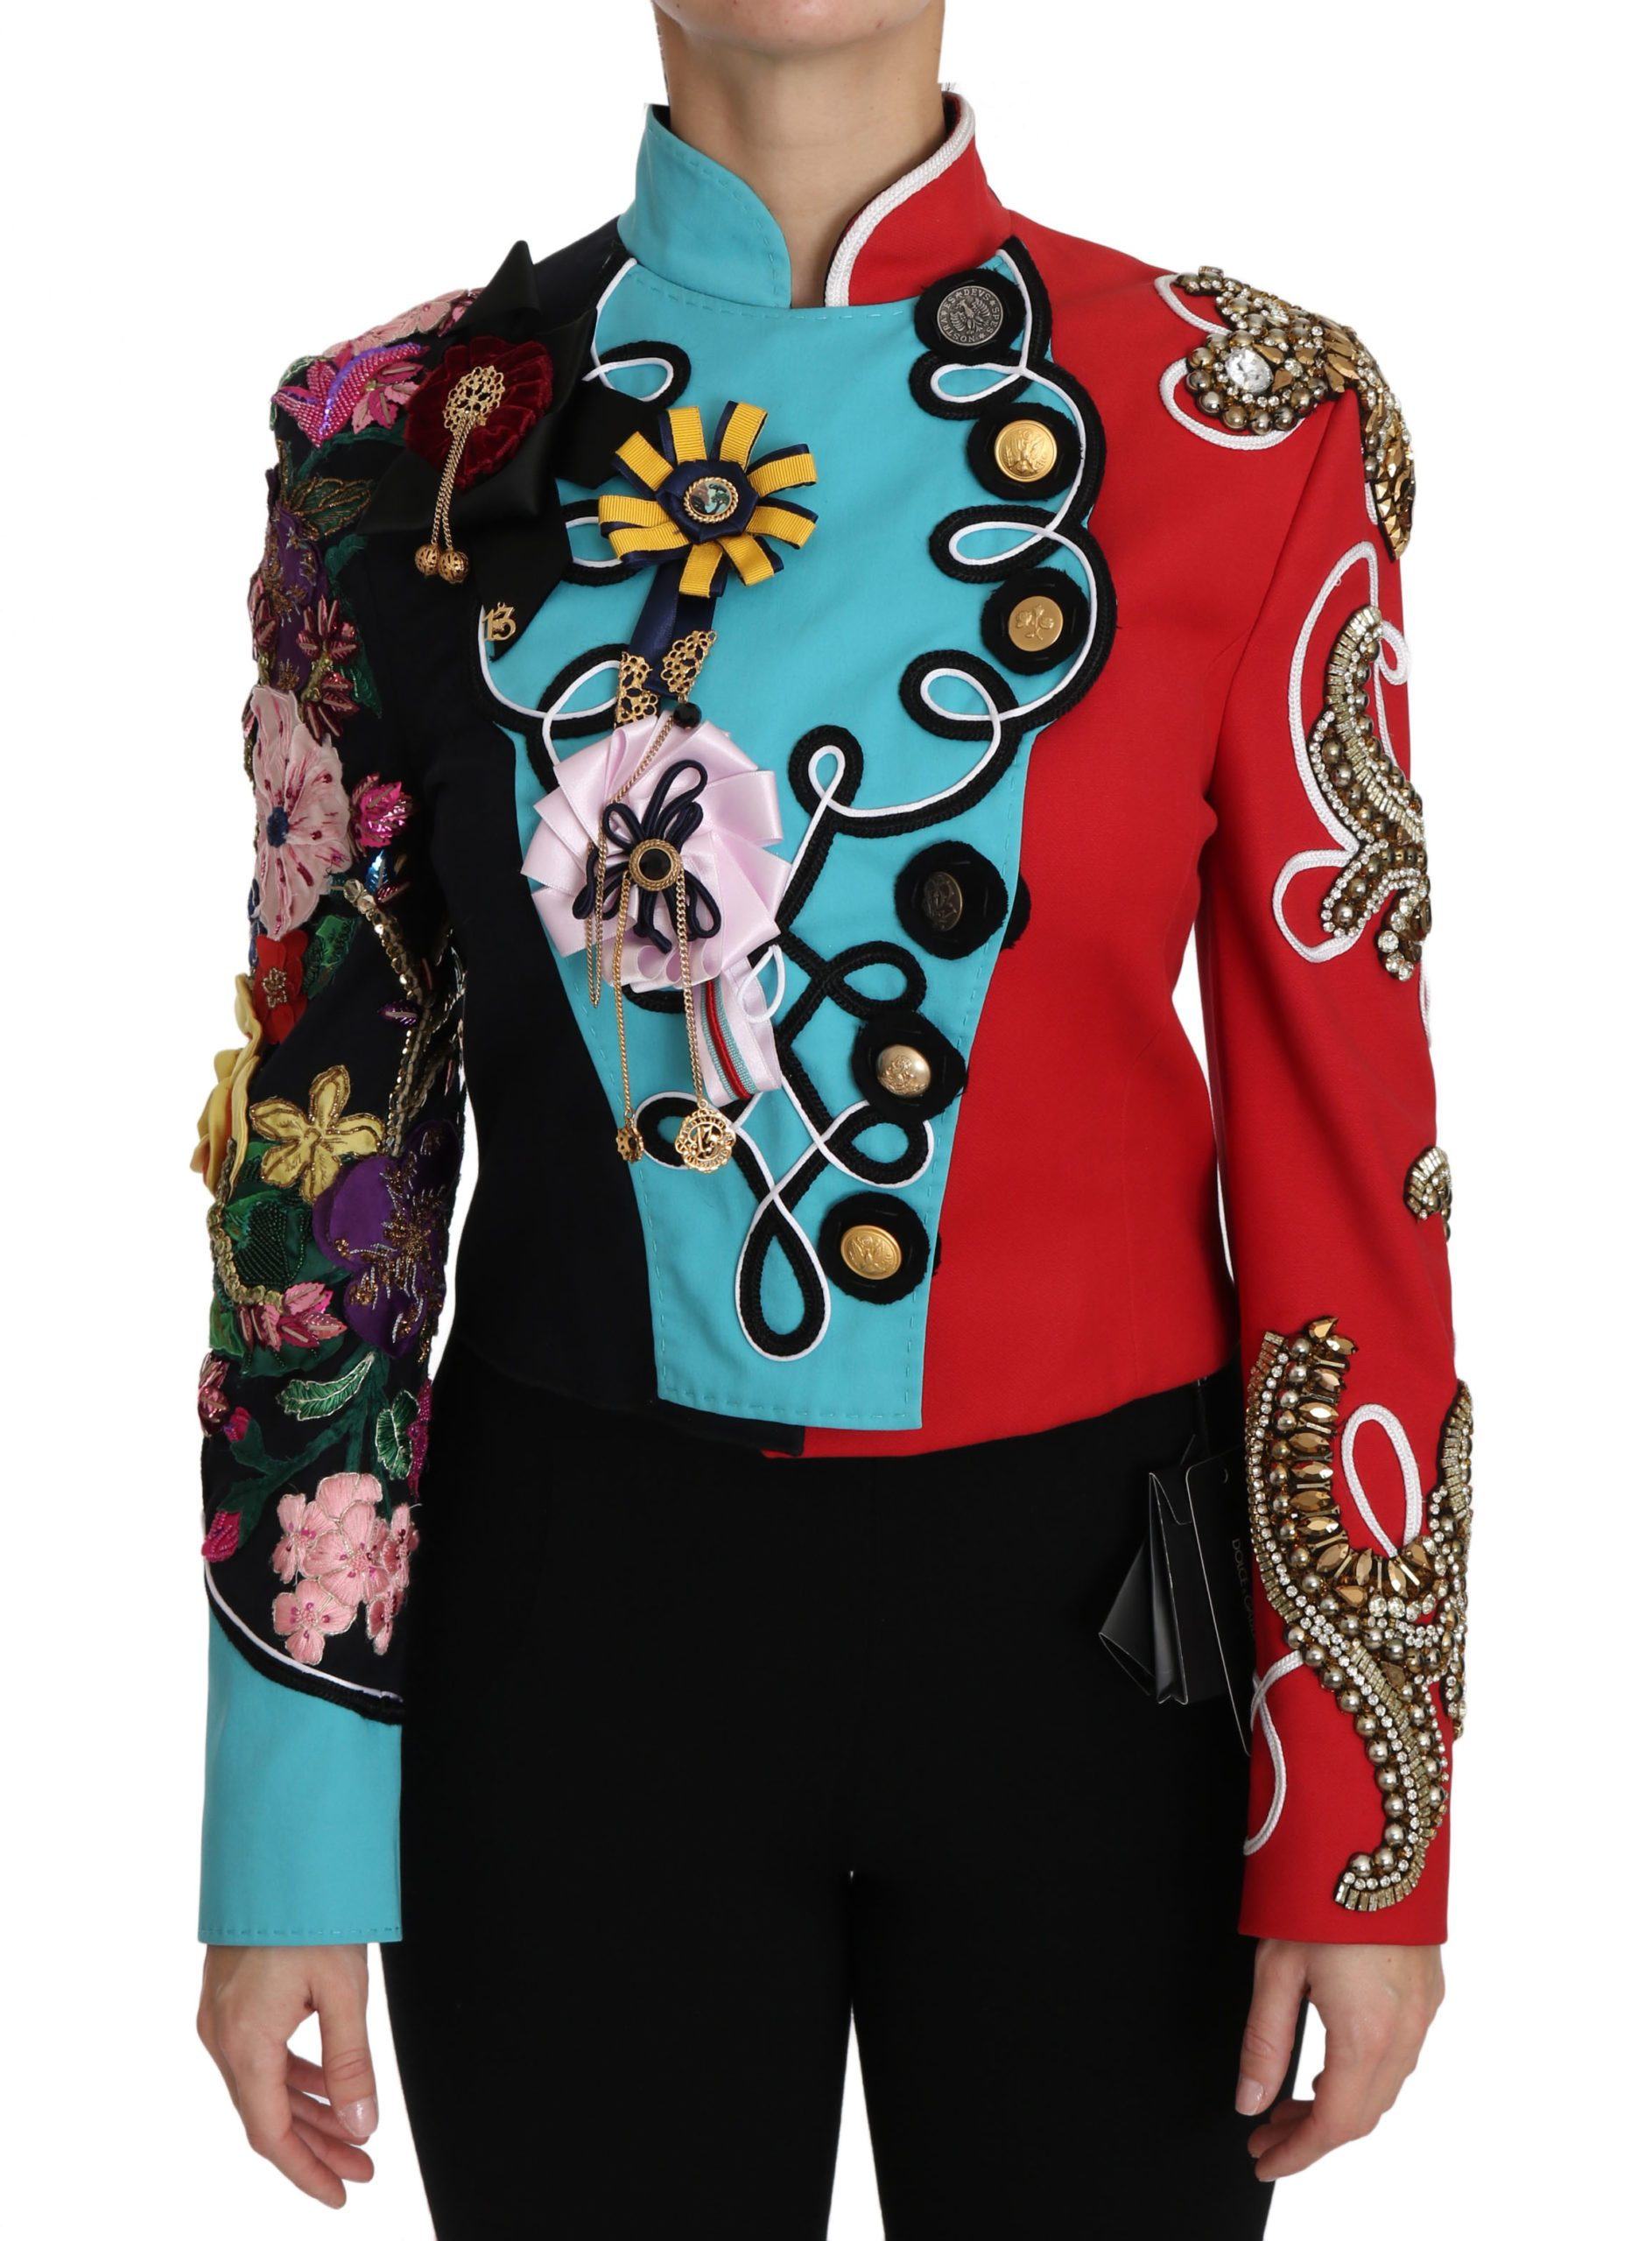 Dolce & Gabbana Women's Crystal Floral Baroque Sicily Jacket Red JKT2411 - IT38   S